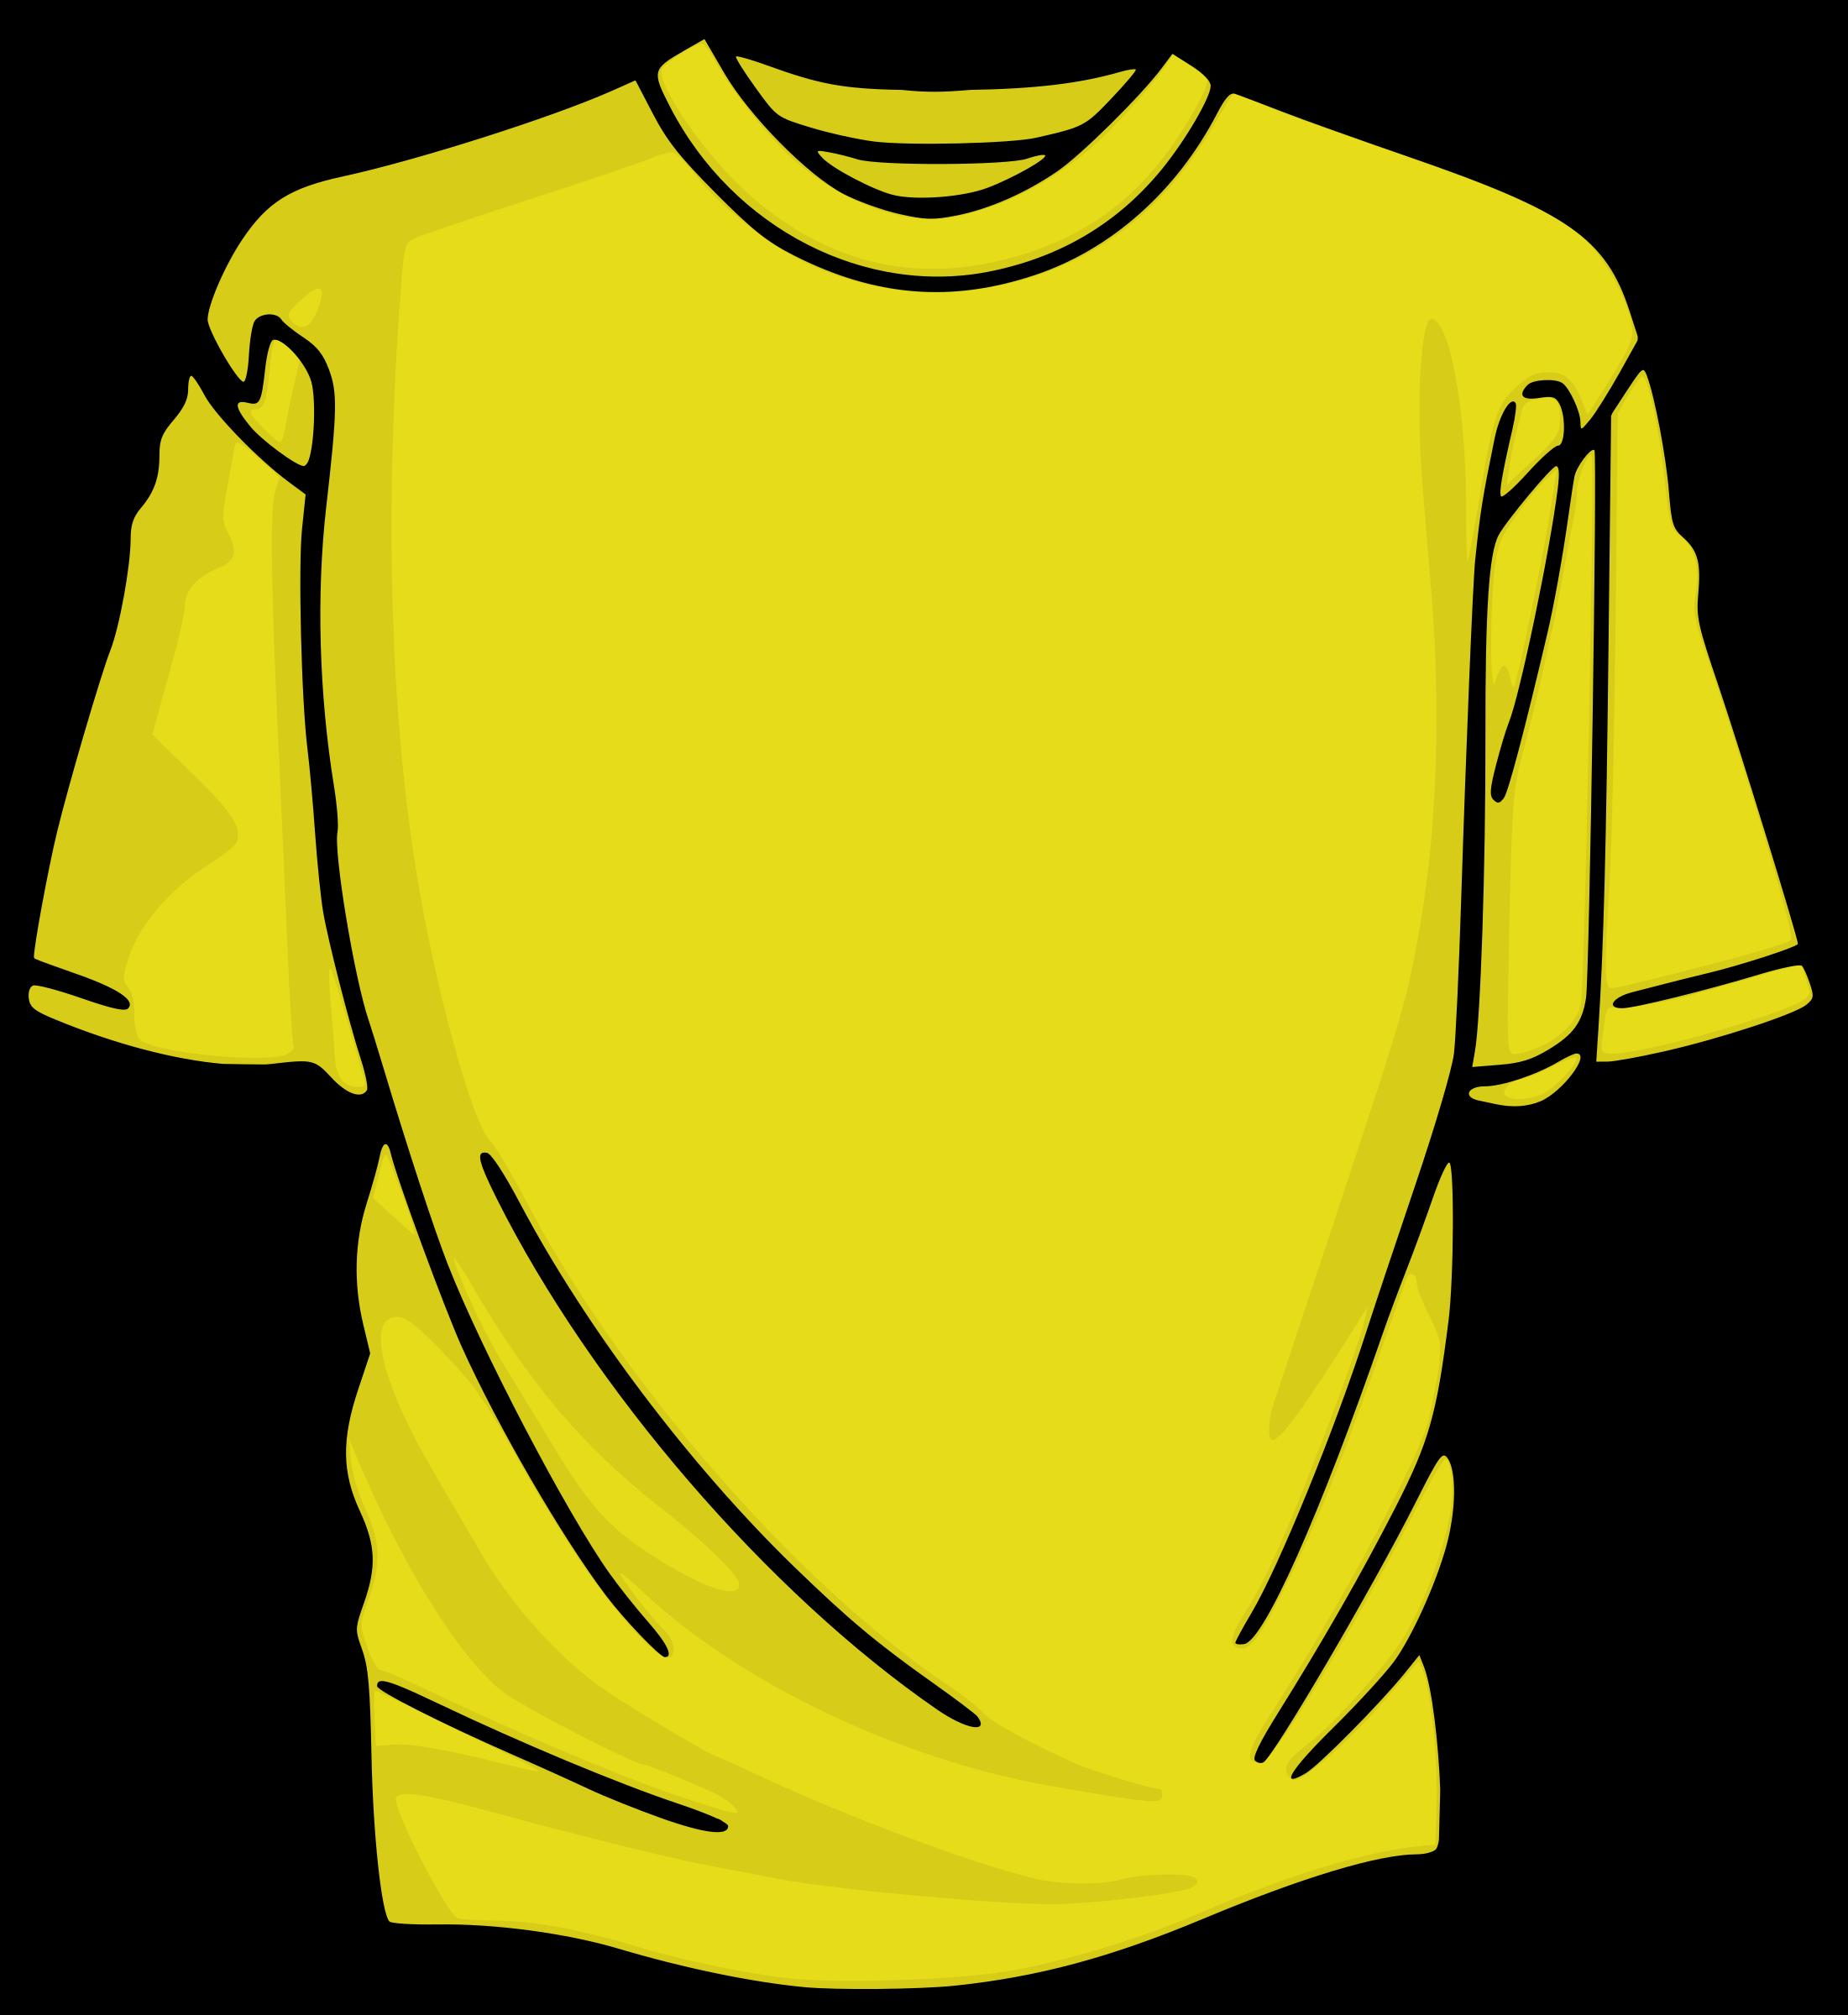 Yellow Tshirt Clipart.